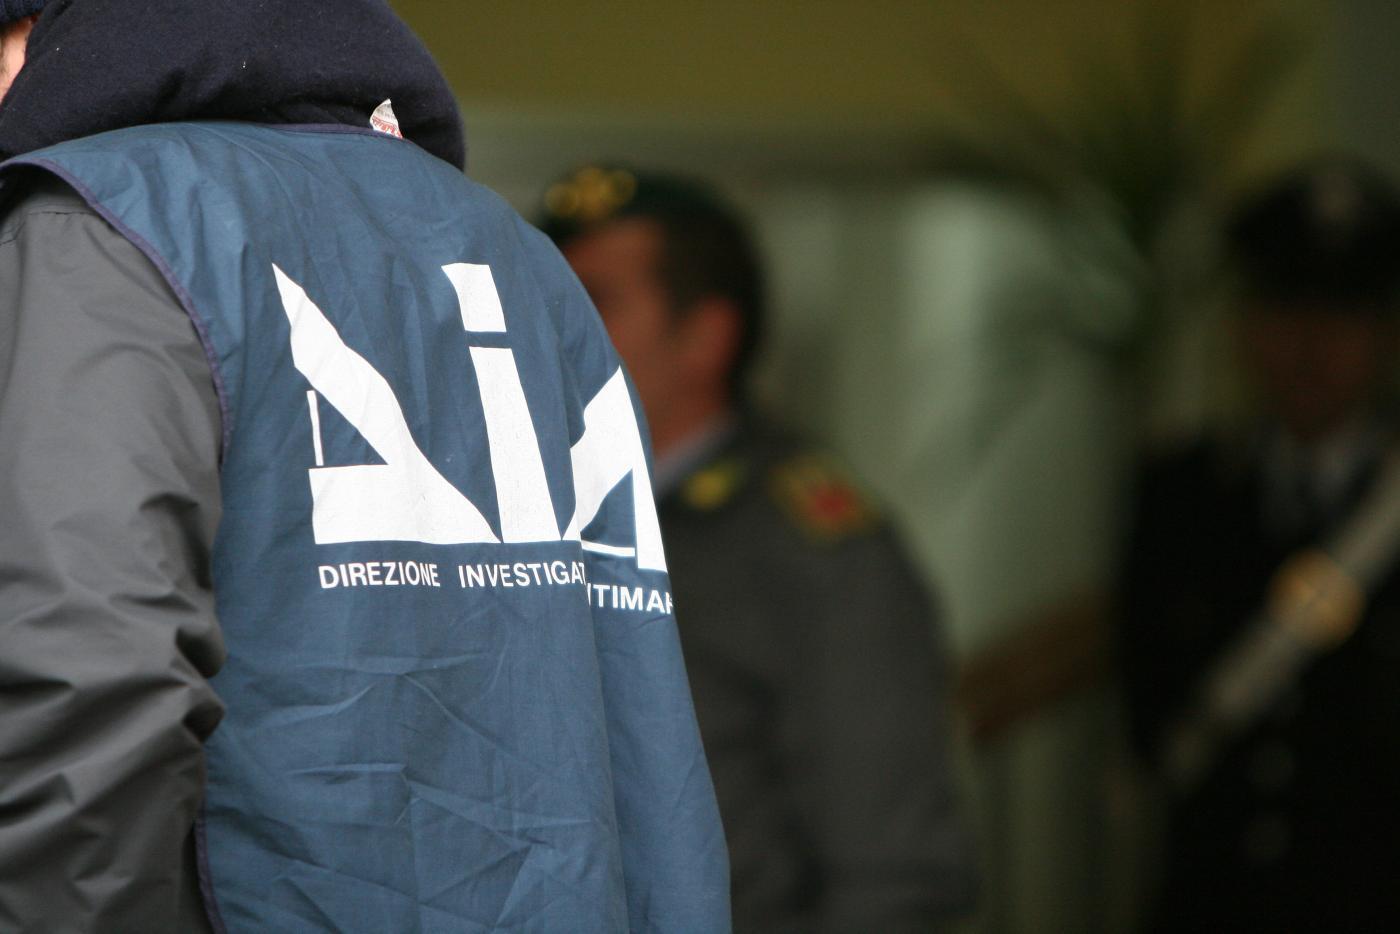 Mafia: imprese e terreni sequestrati tra Caltanissetta e Bucarest